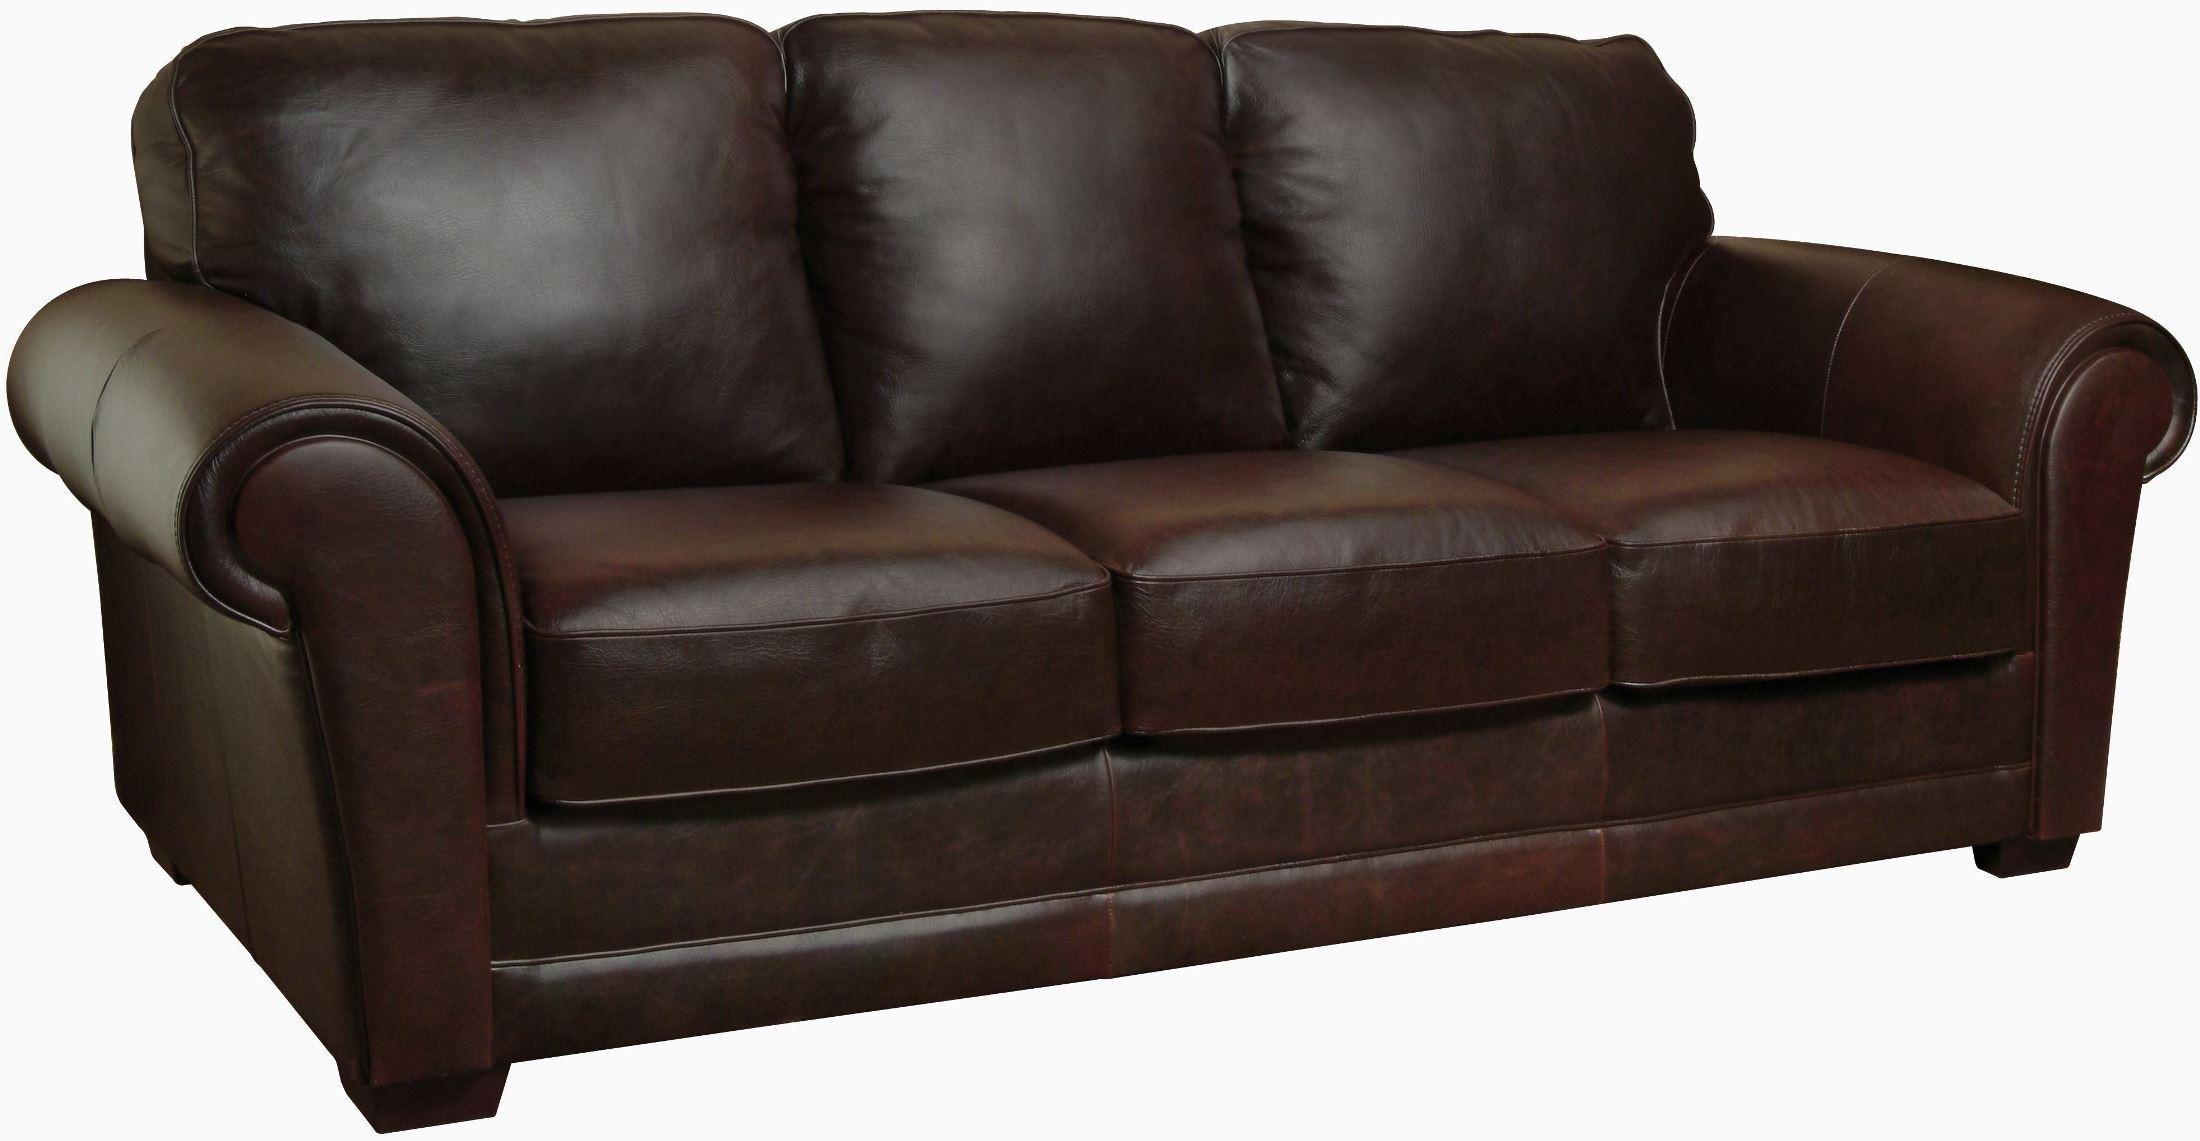 leather sofa washington dc companies online mark whiskey finish italian luk s